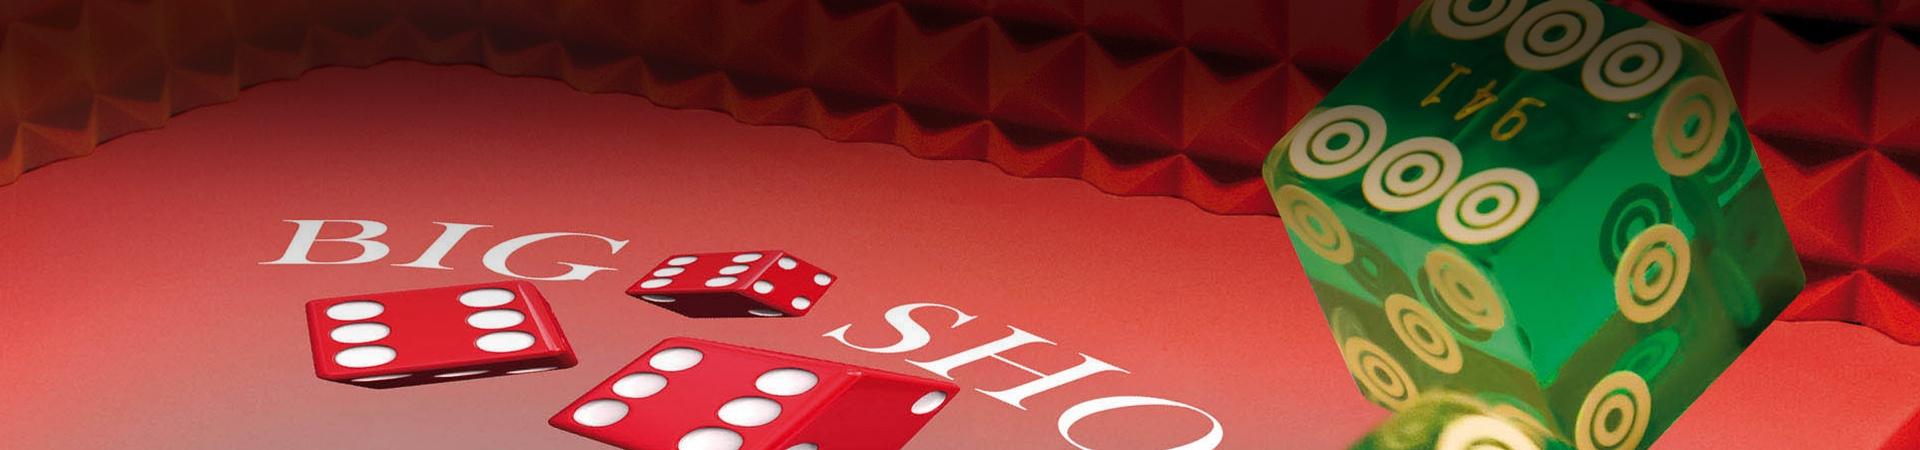 Irish poker boards